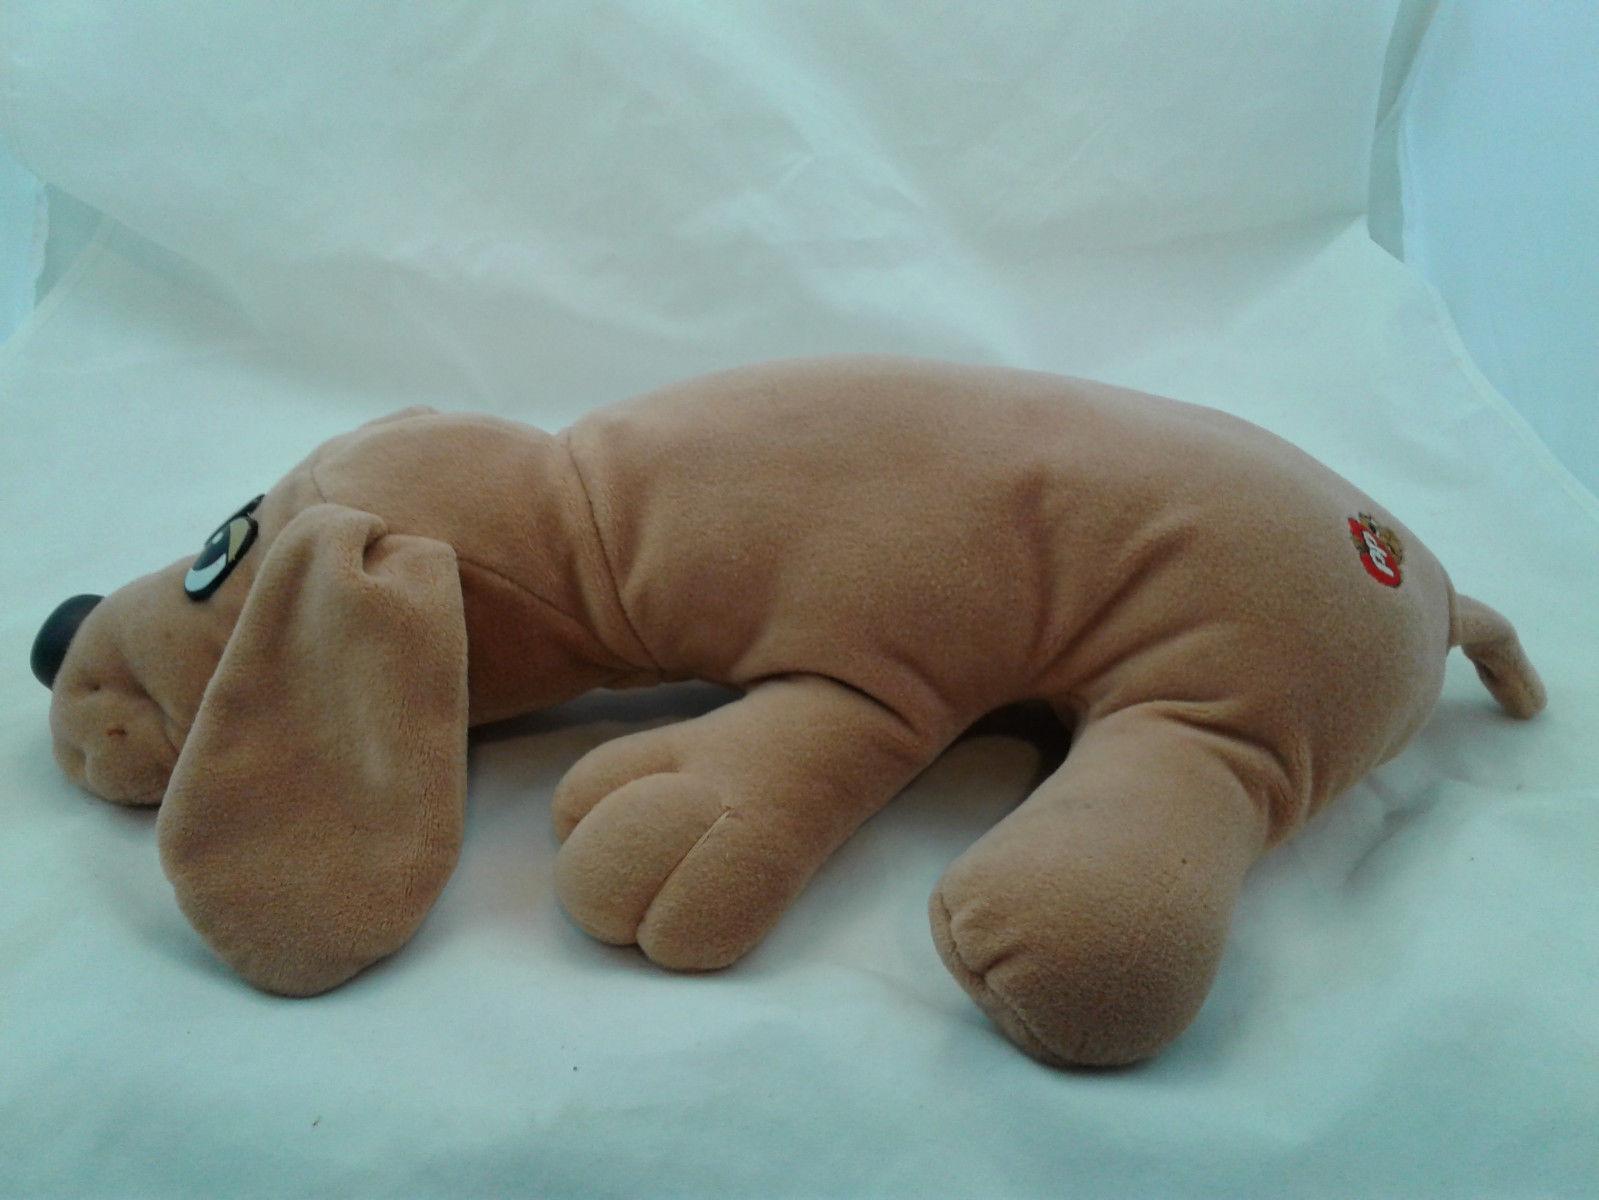 1985 Tonka Pound Puppies Plush Stuffed Toy and 12 similar items